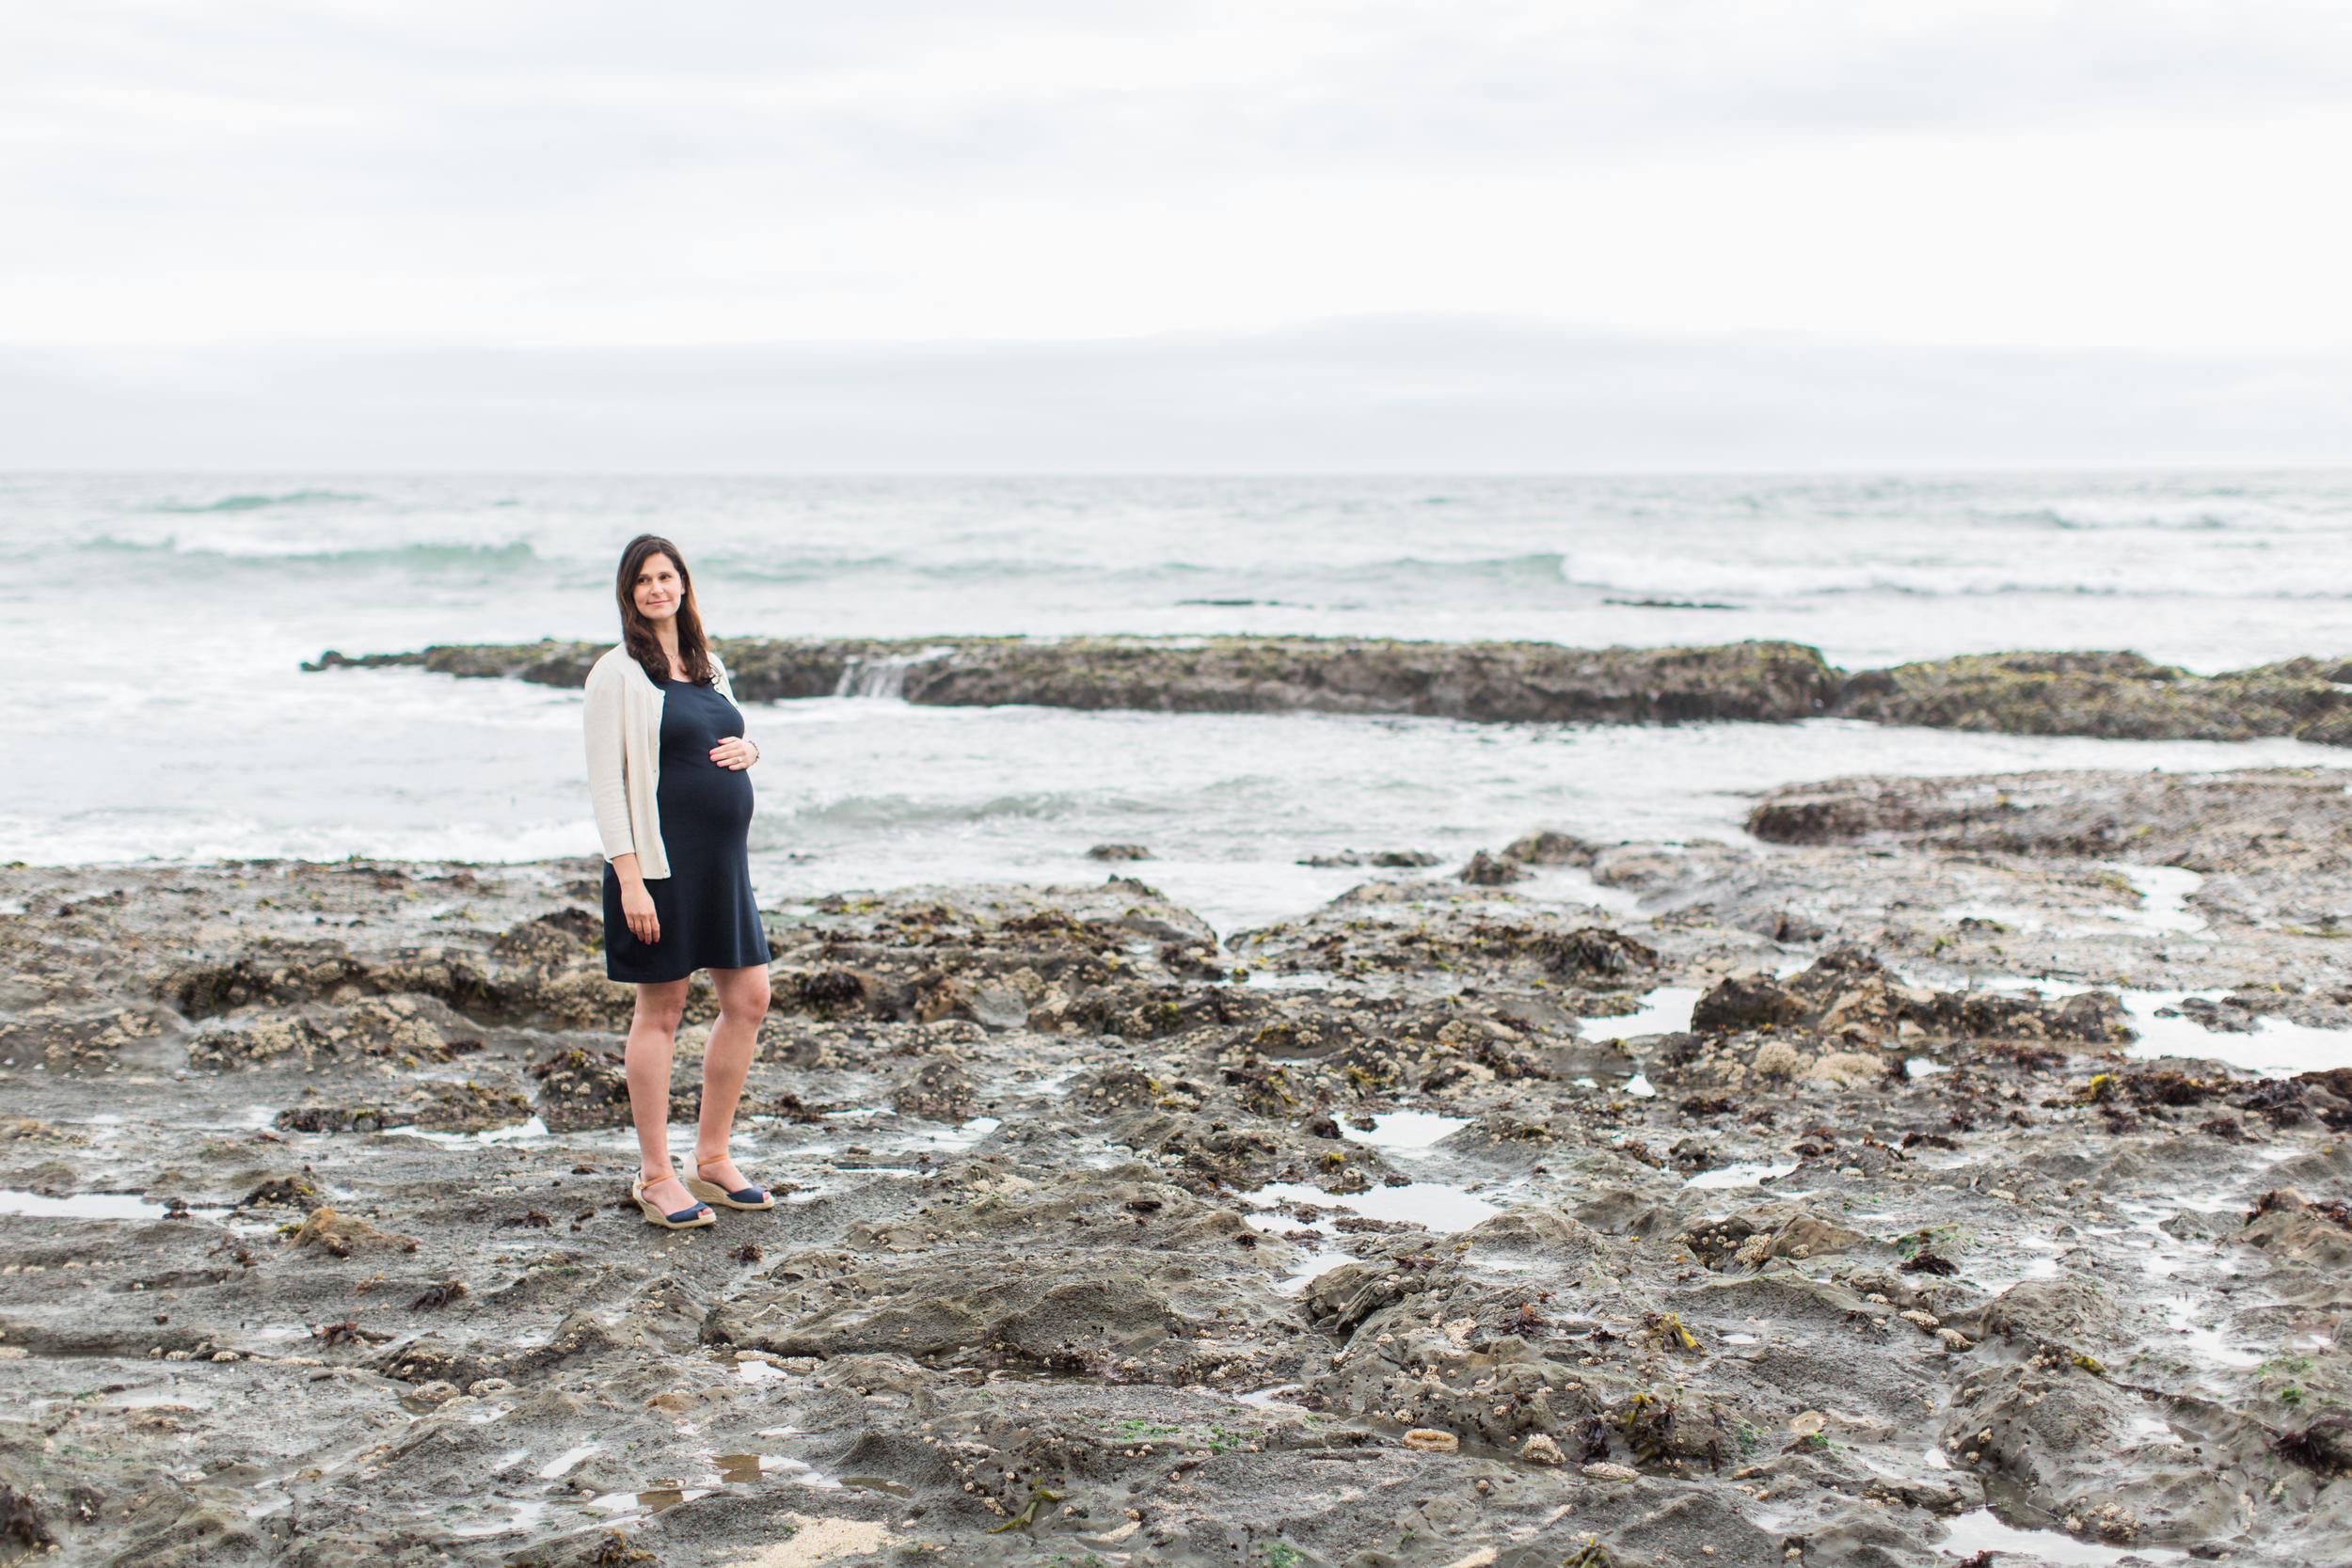 half-moon-bay-california-maternity-photography-1-10.jpg